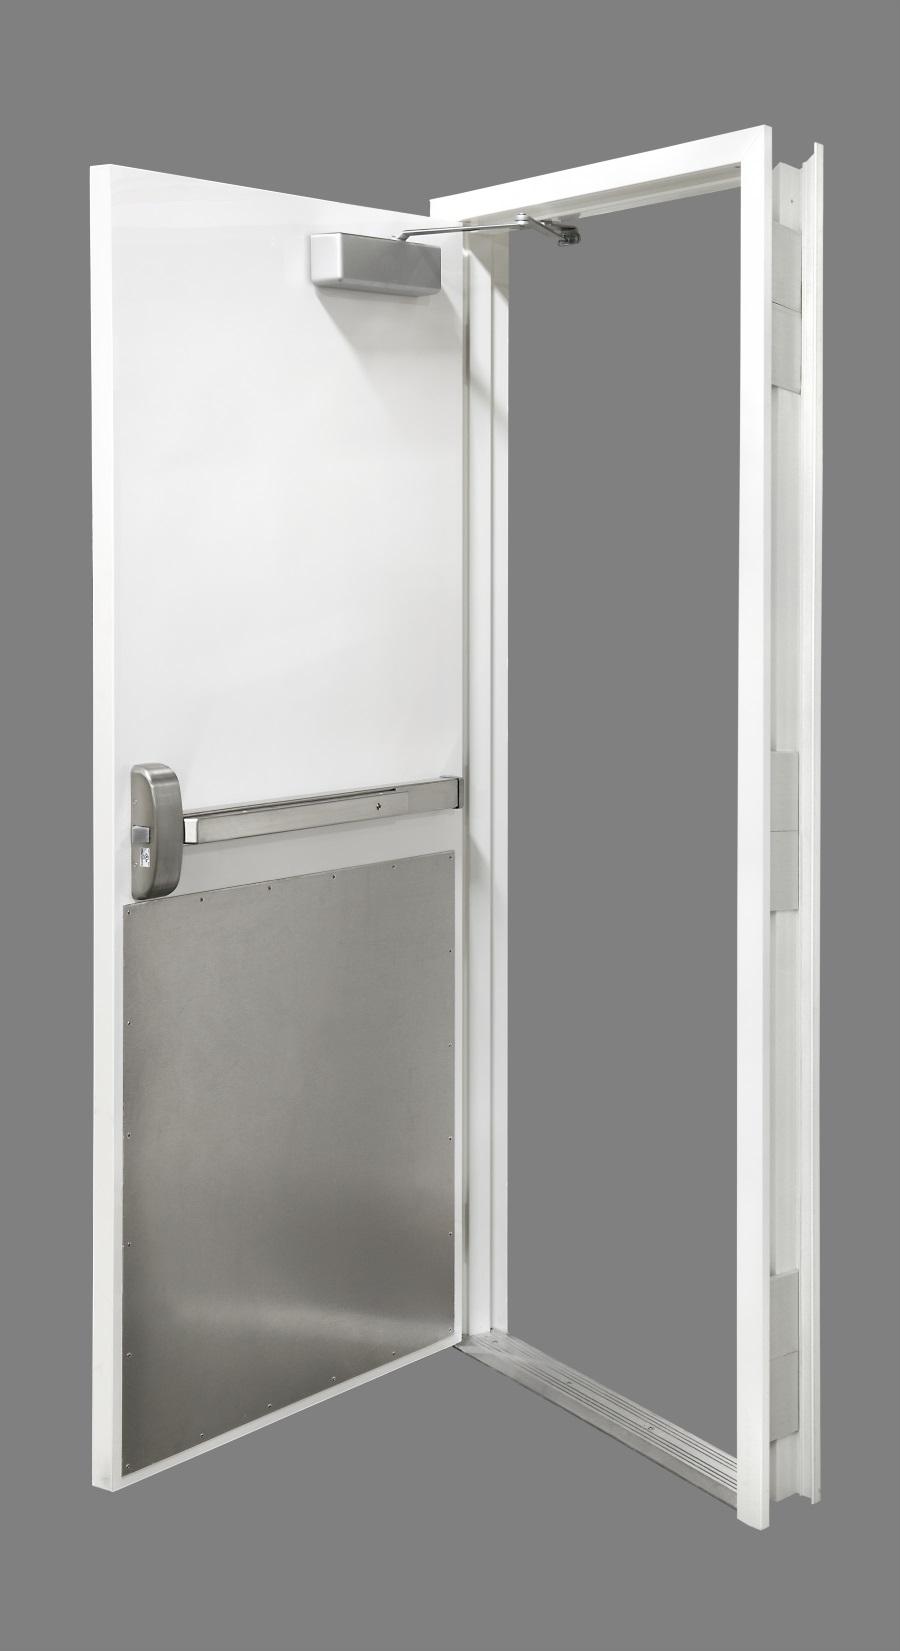 Fiberglass architectural-style doors for tough environments & Fiberglass architectural-style doors for tough environments | 2018 ...